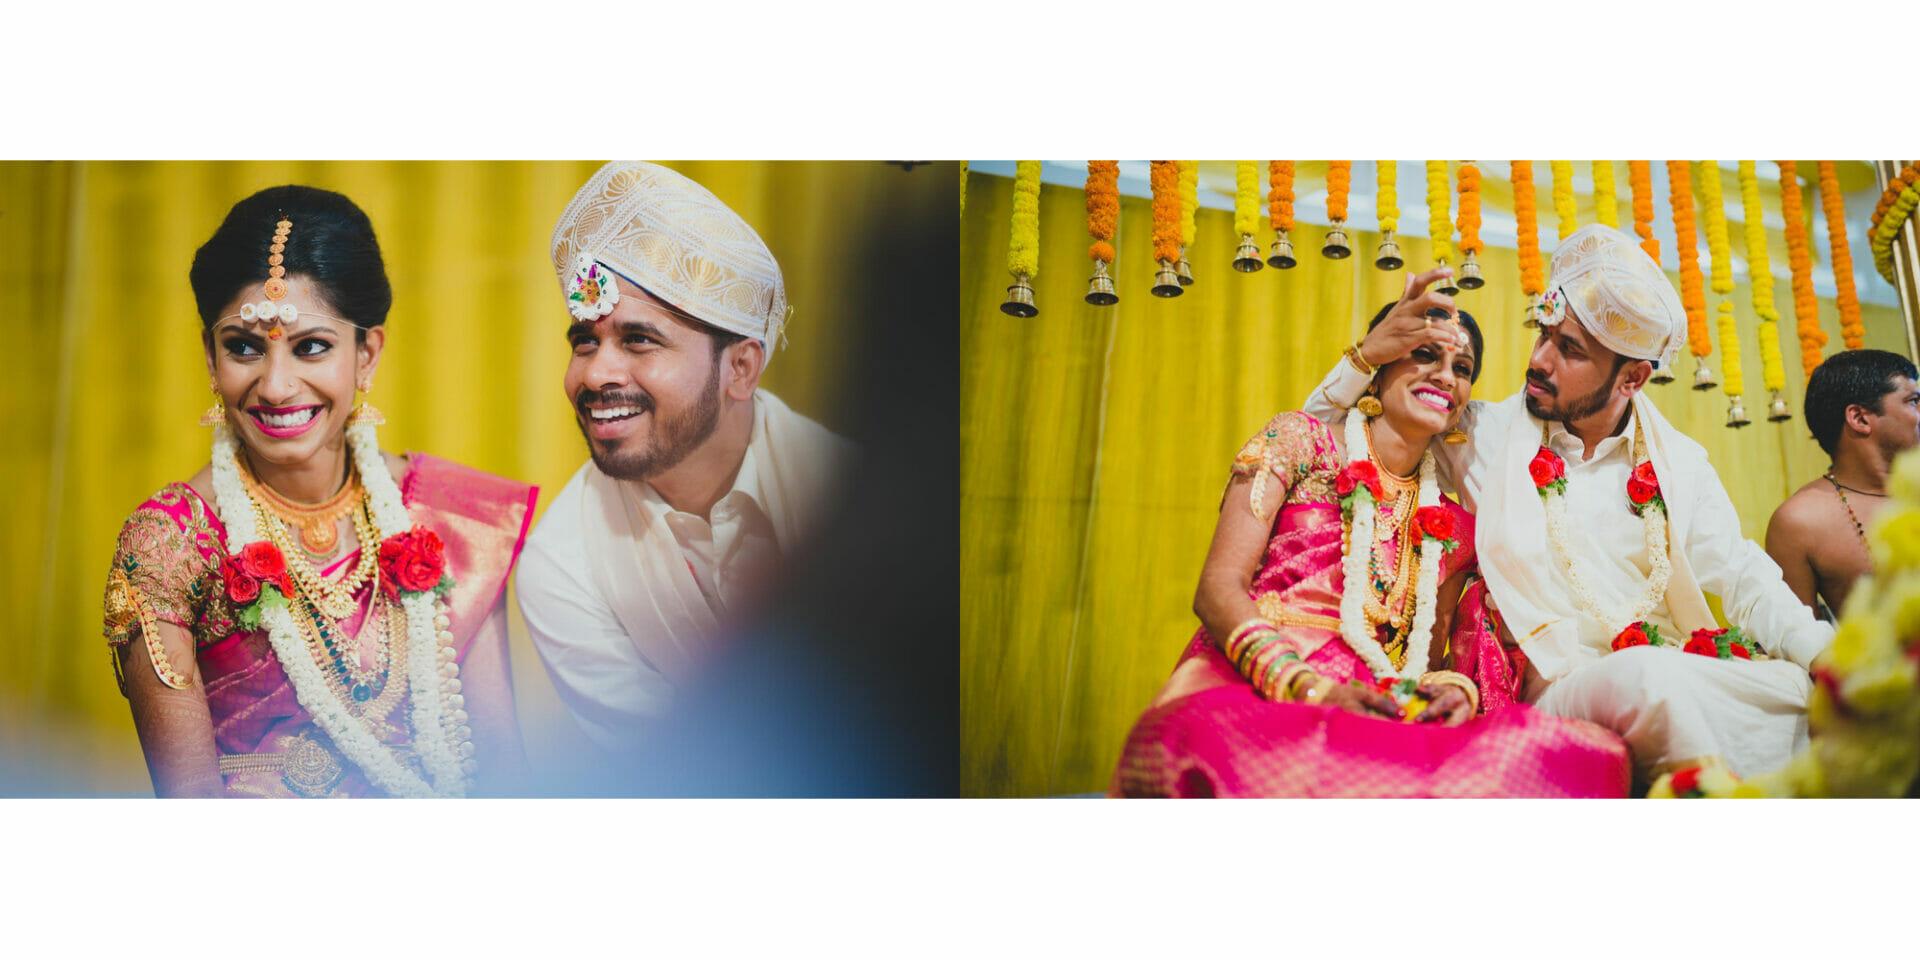 shruti annayya sree vikash photography wedding kalathur gardens 42